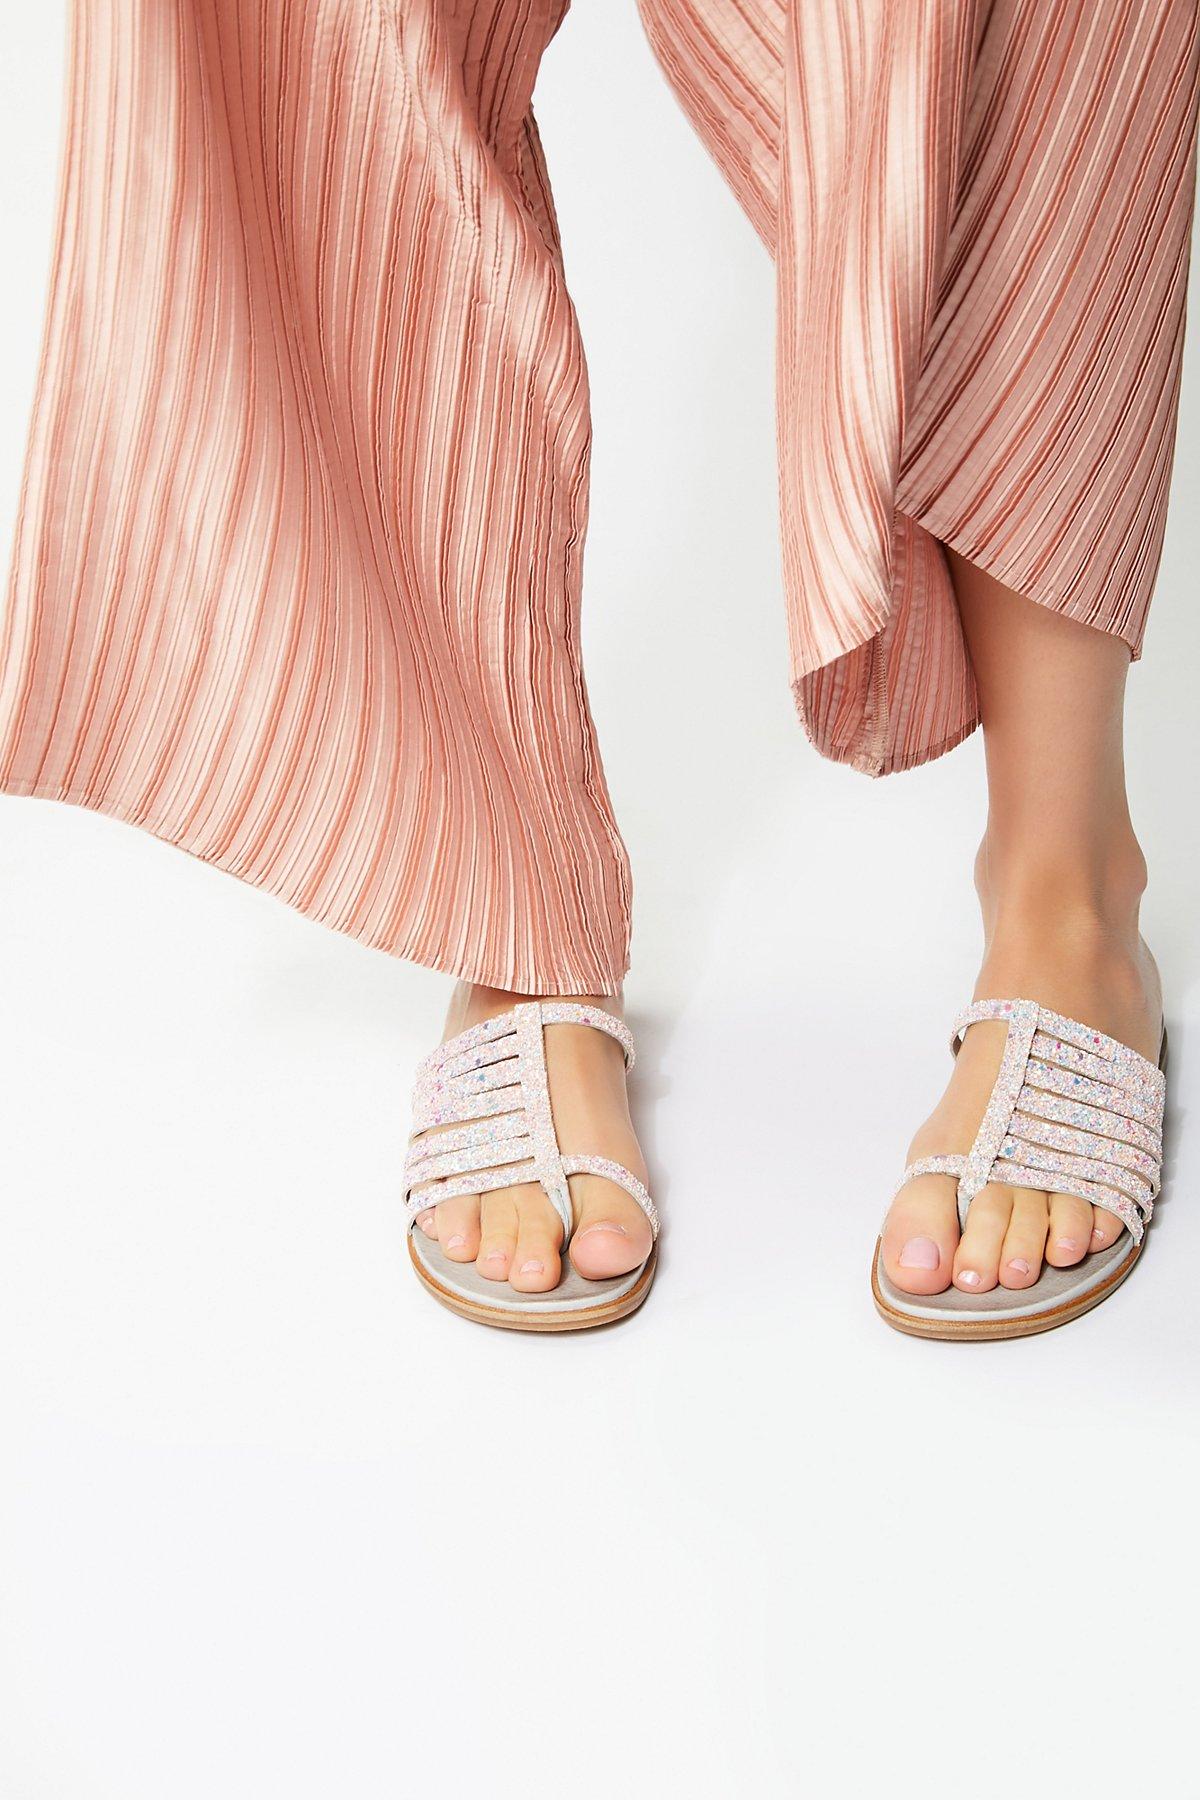 Prism Sandal